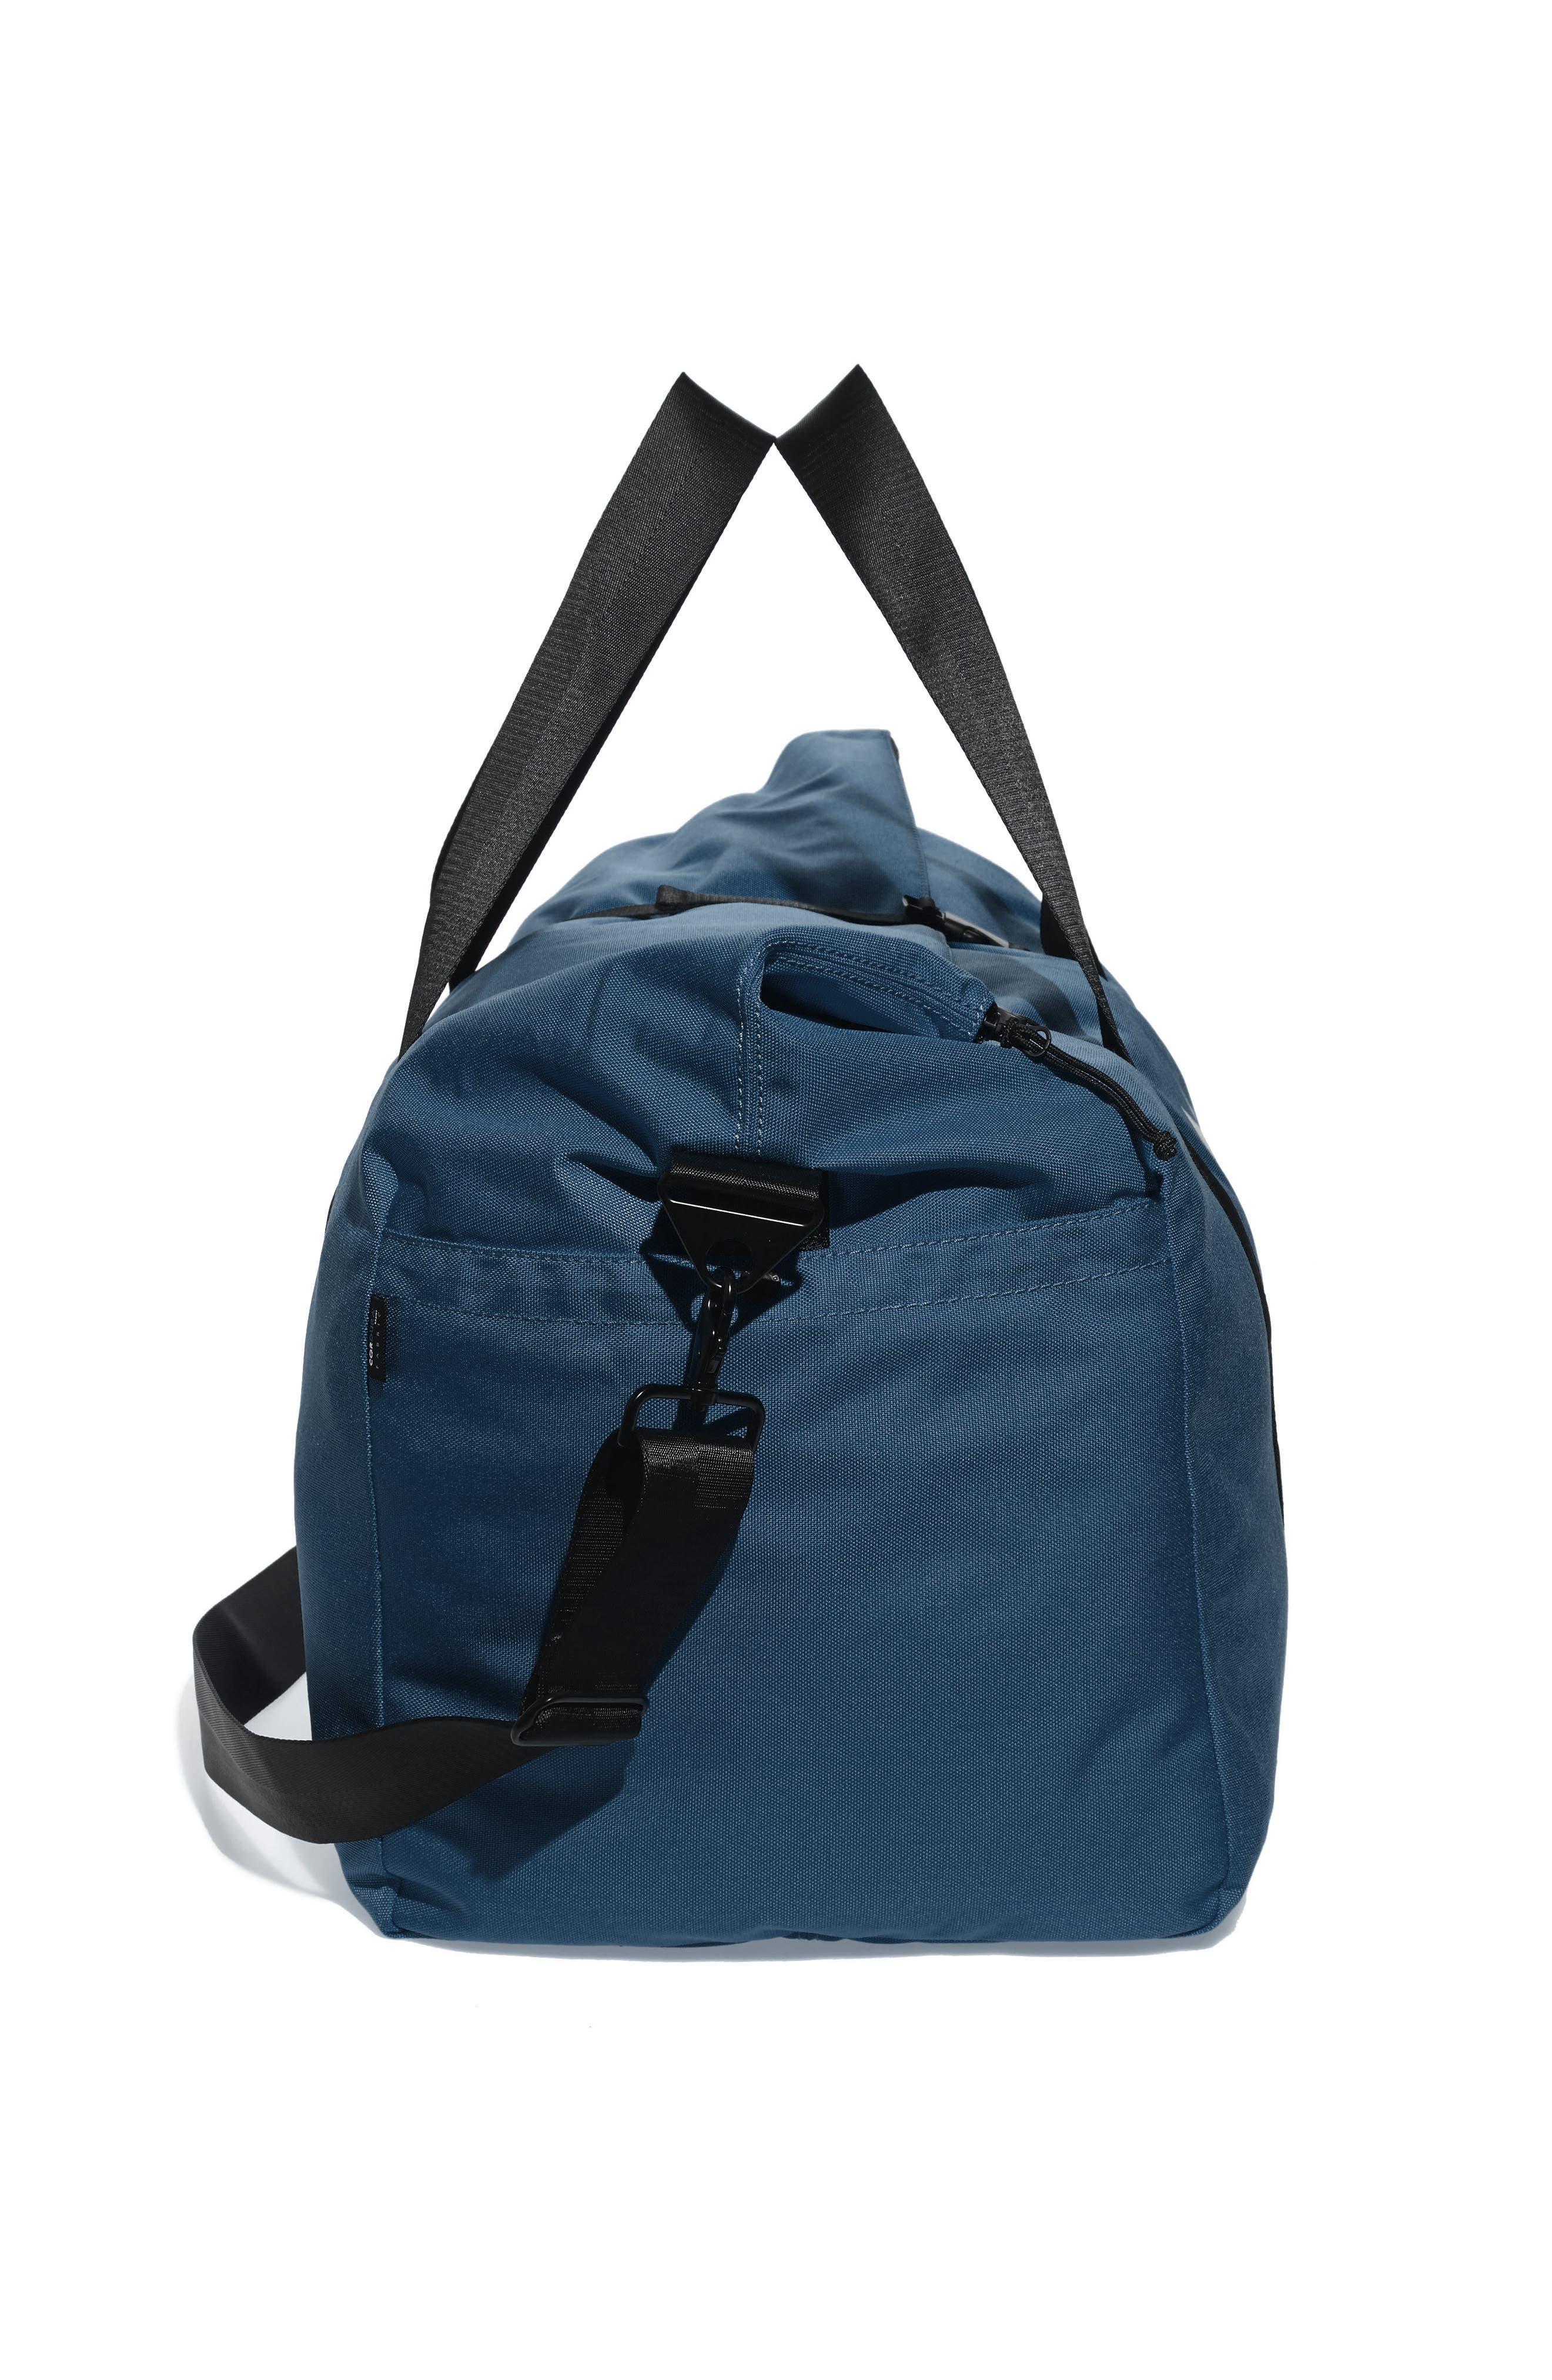 SWS 100L Roll Top Duffel Bag,                             Alternate thumbnail 4, color,                             NAVY